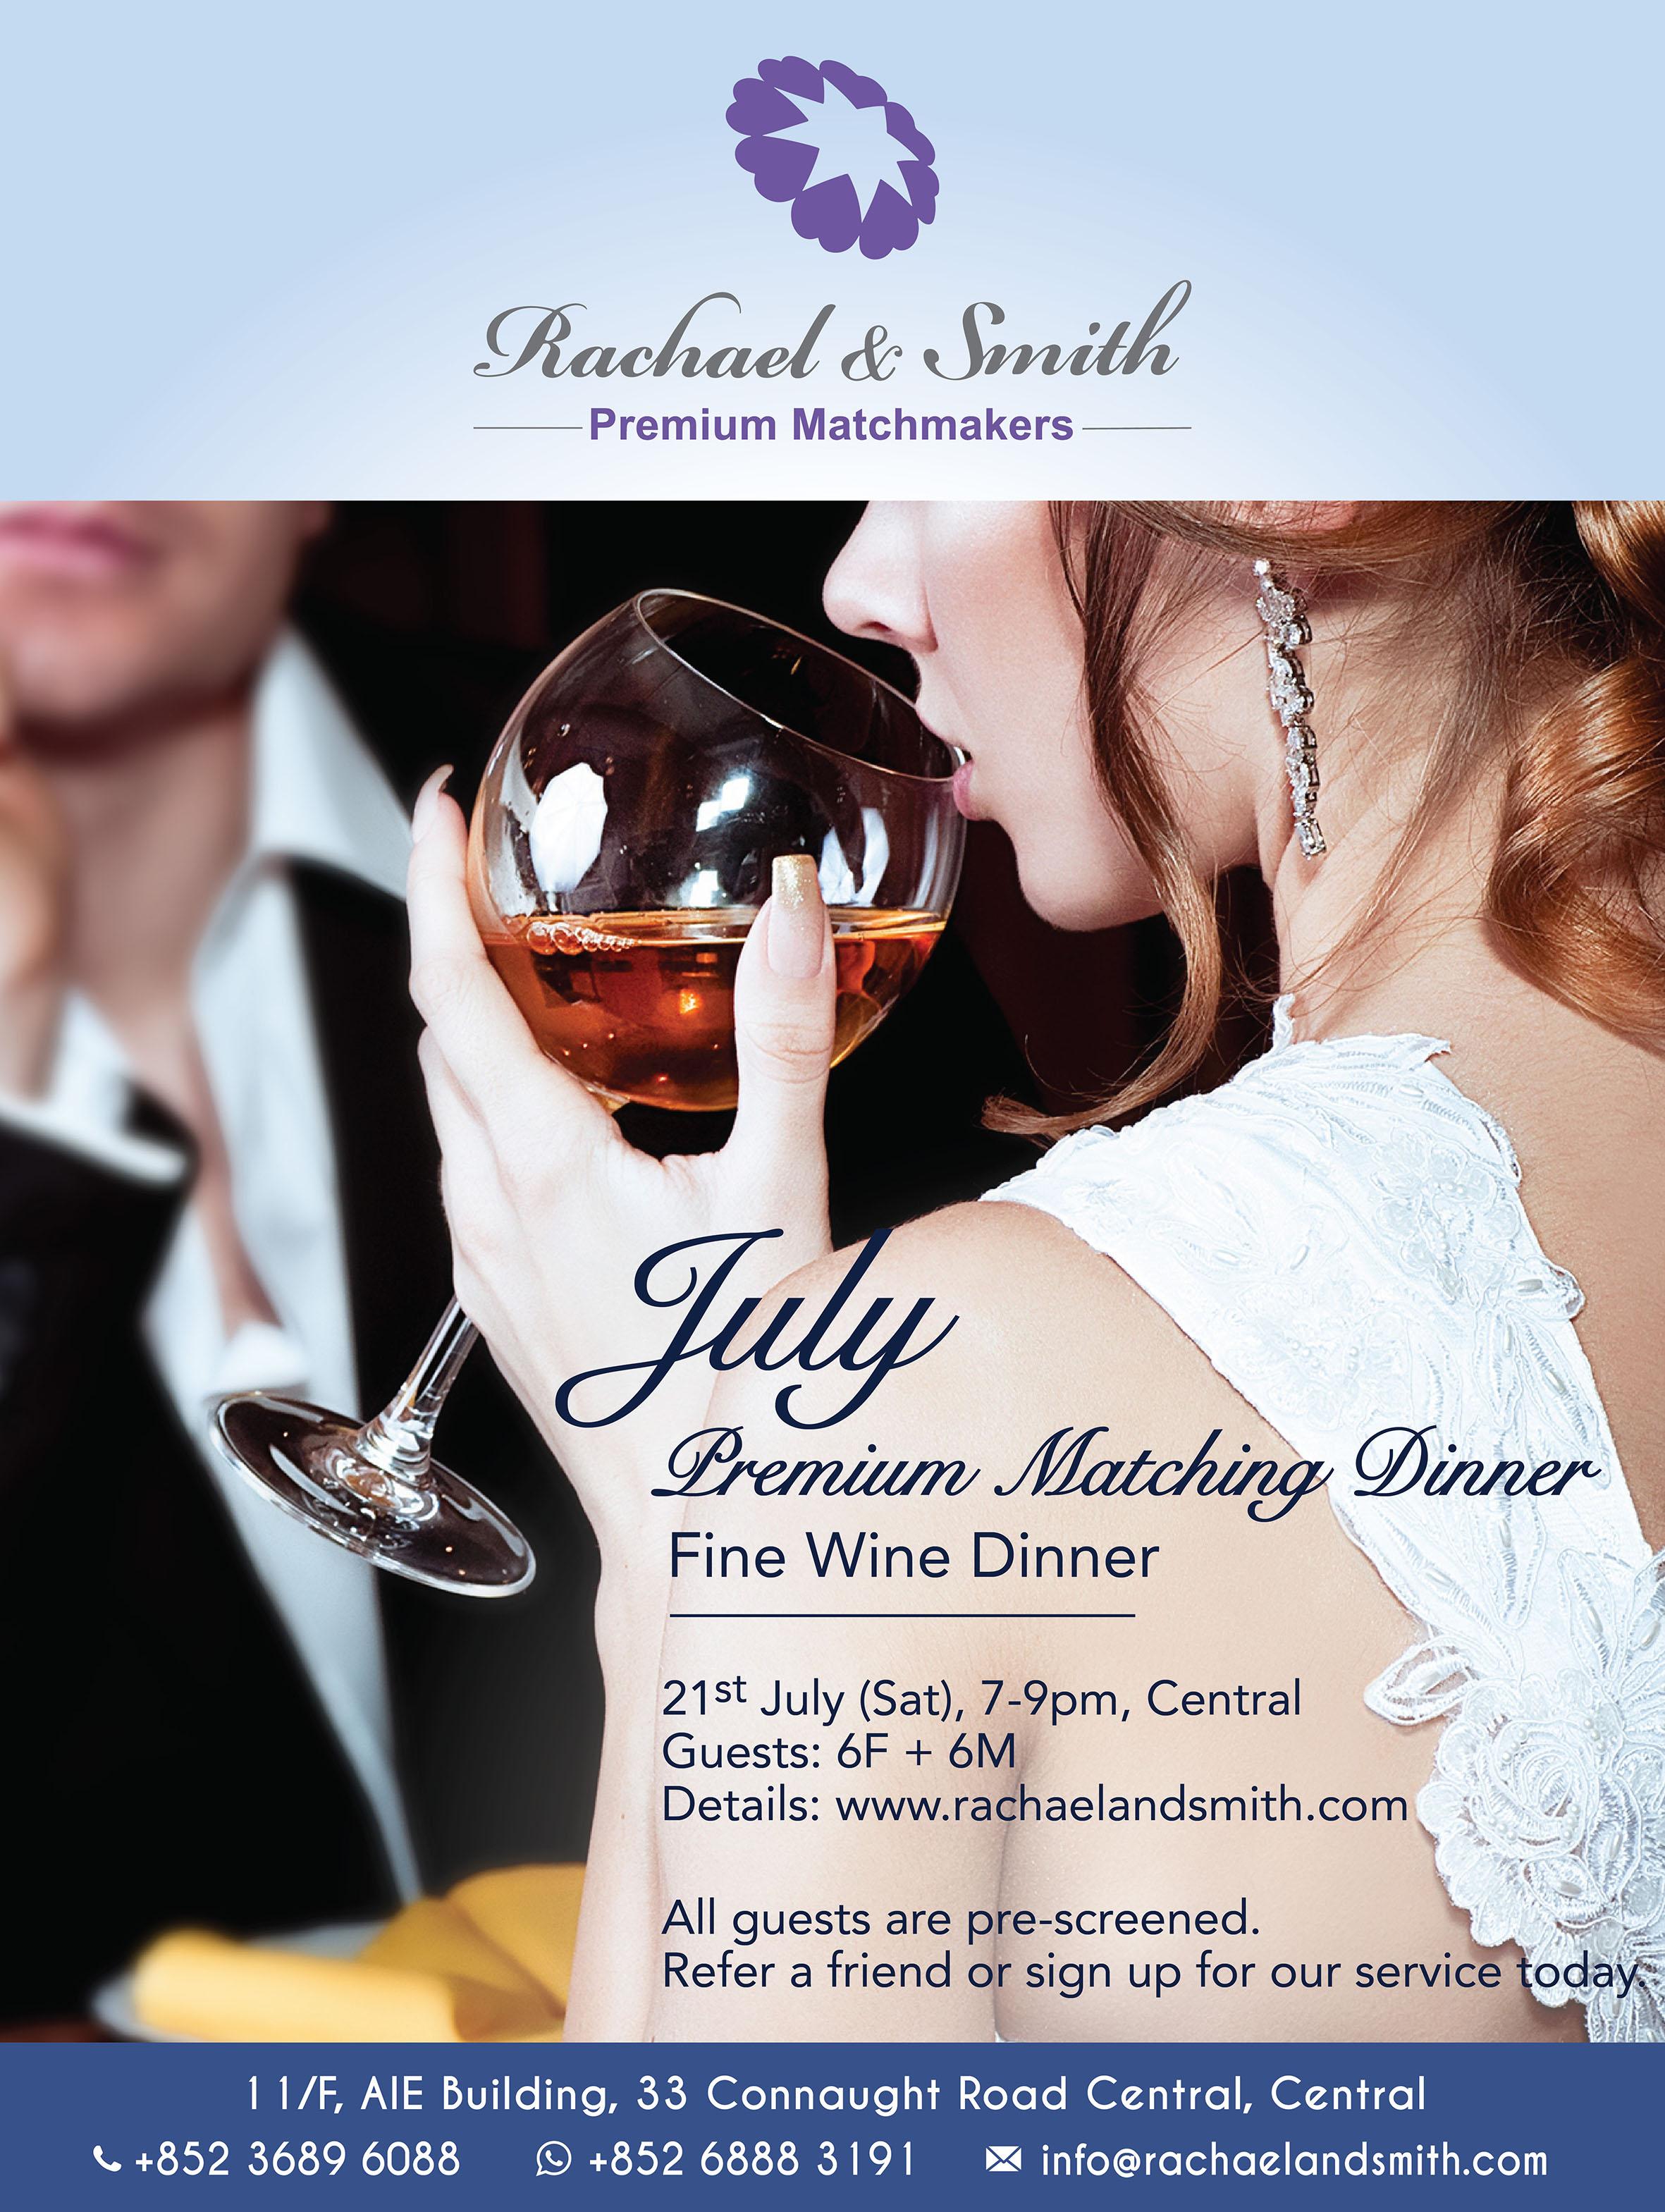 Rachael & Smith, Premium Matchmakers, Premium Dinner